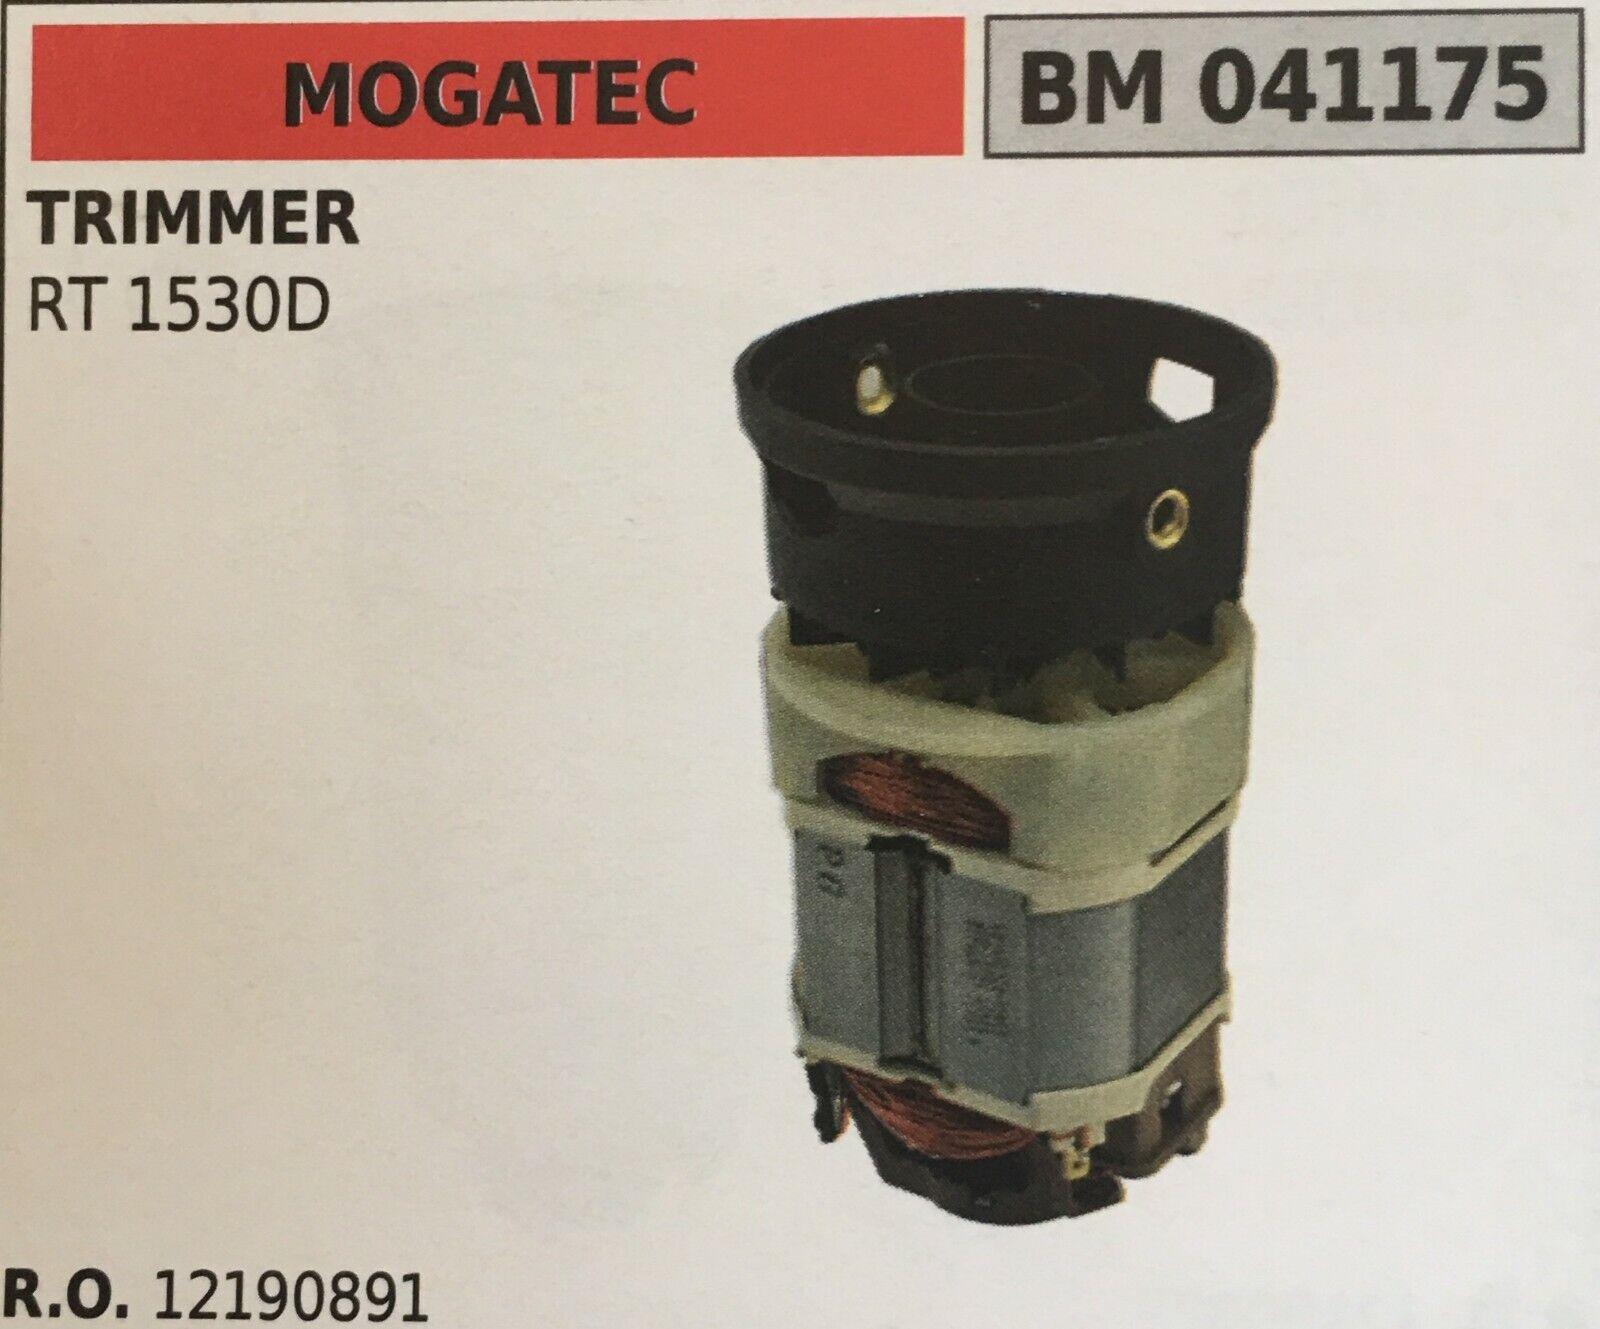 MOTORE ELETTRICO BRUMAR MOGATEC BM041175 TRIMMER RT 1530D